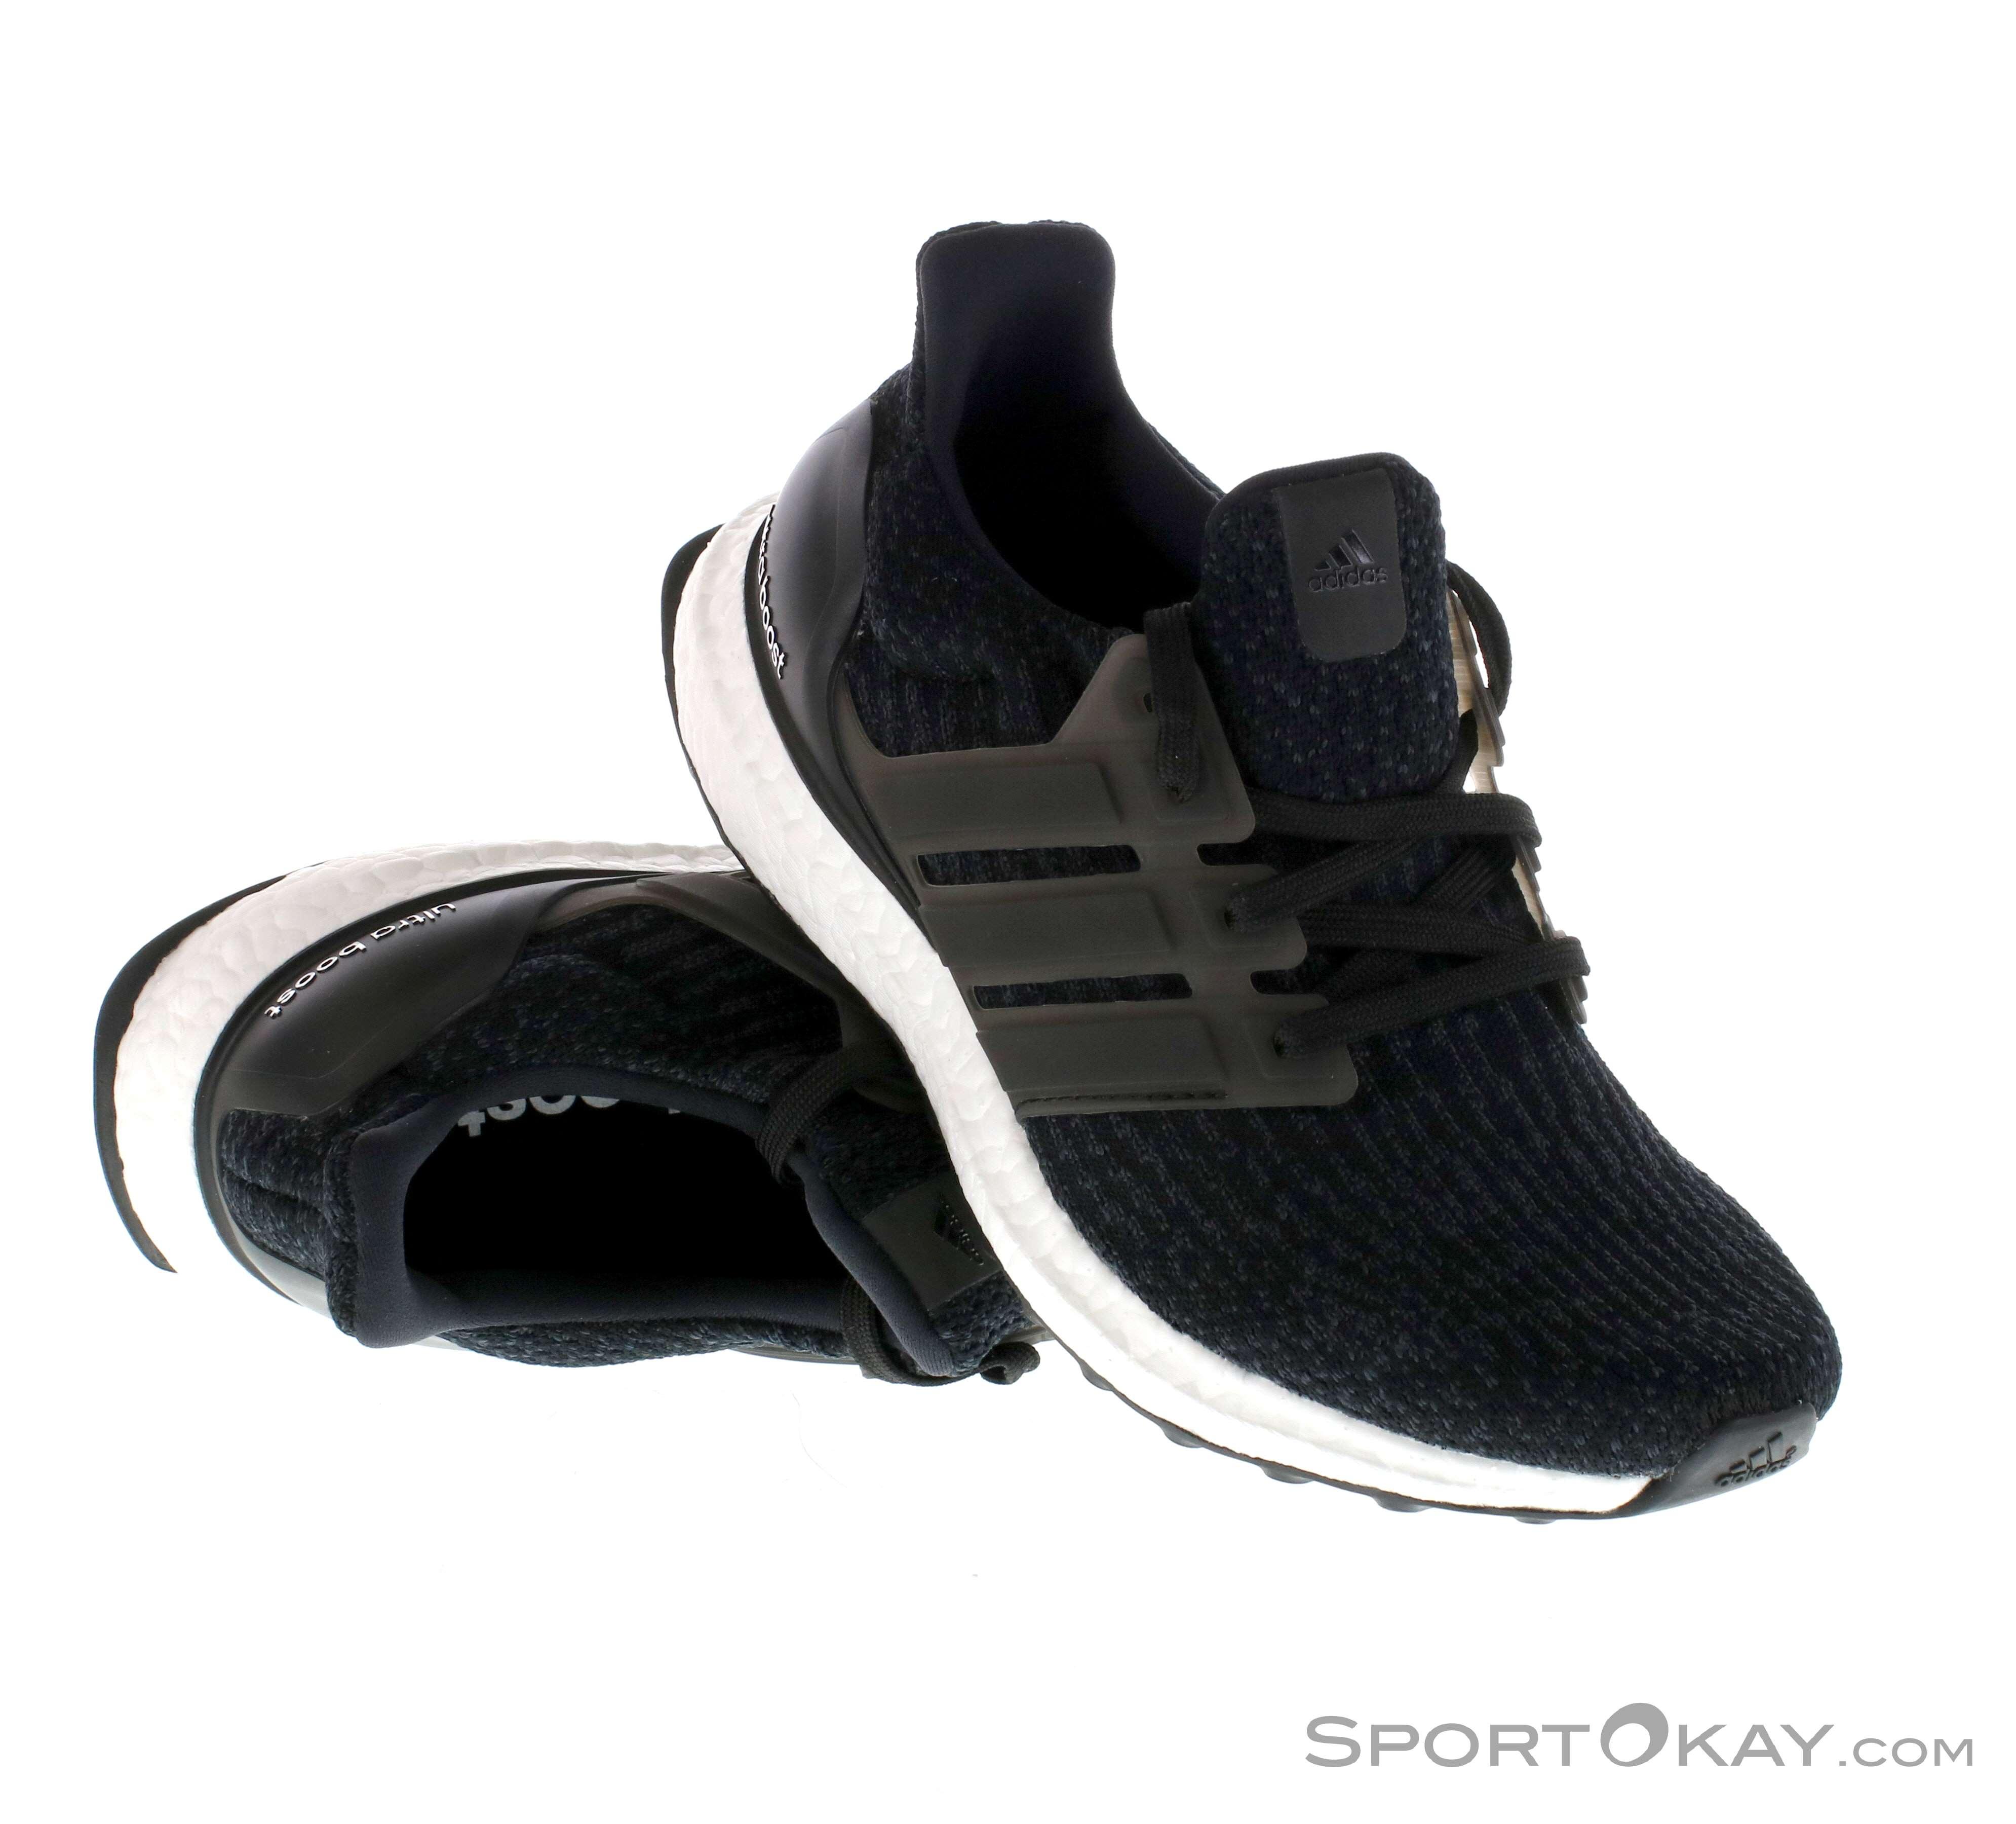 adidas Ultraboost S80682 Black Women's Running Shoes Size 9.5